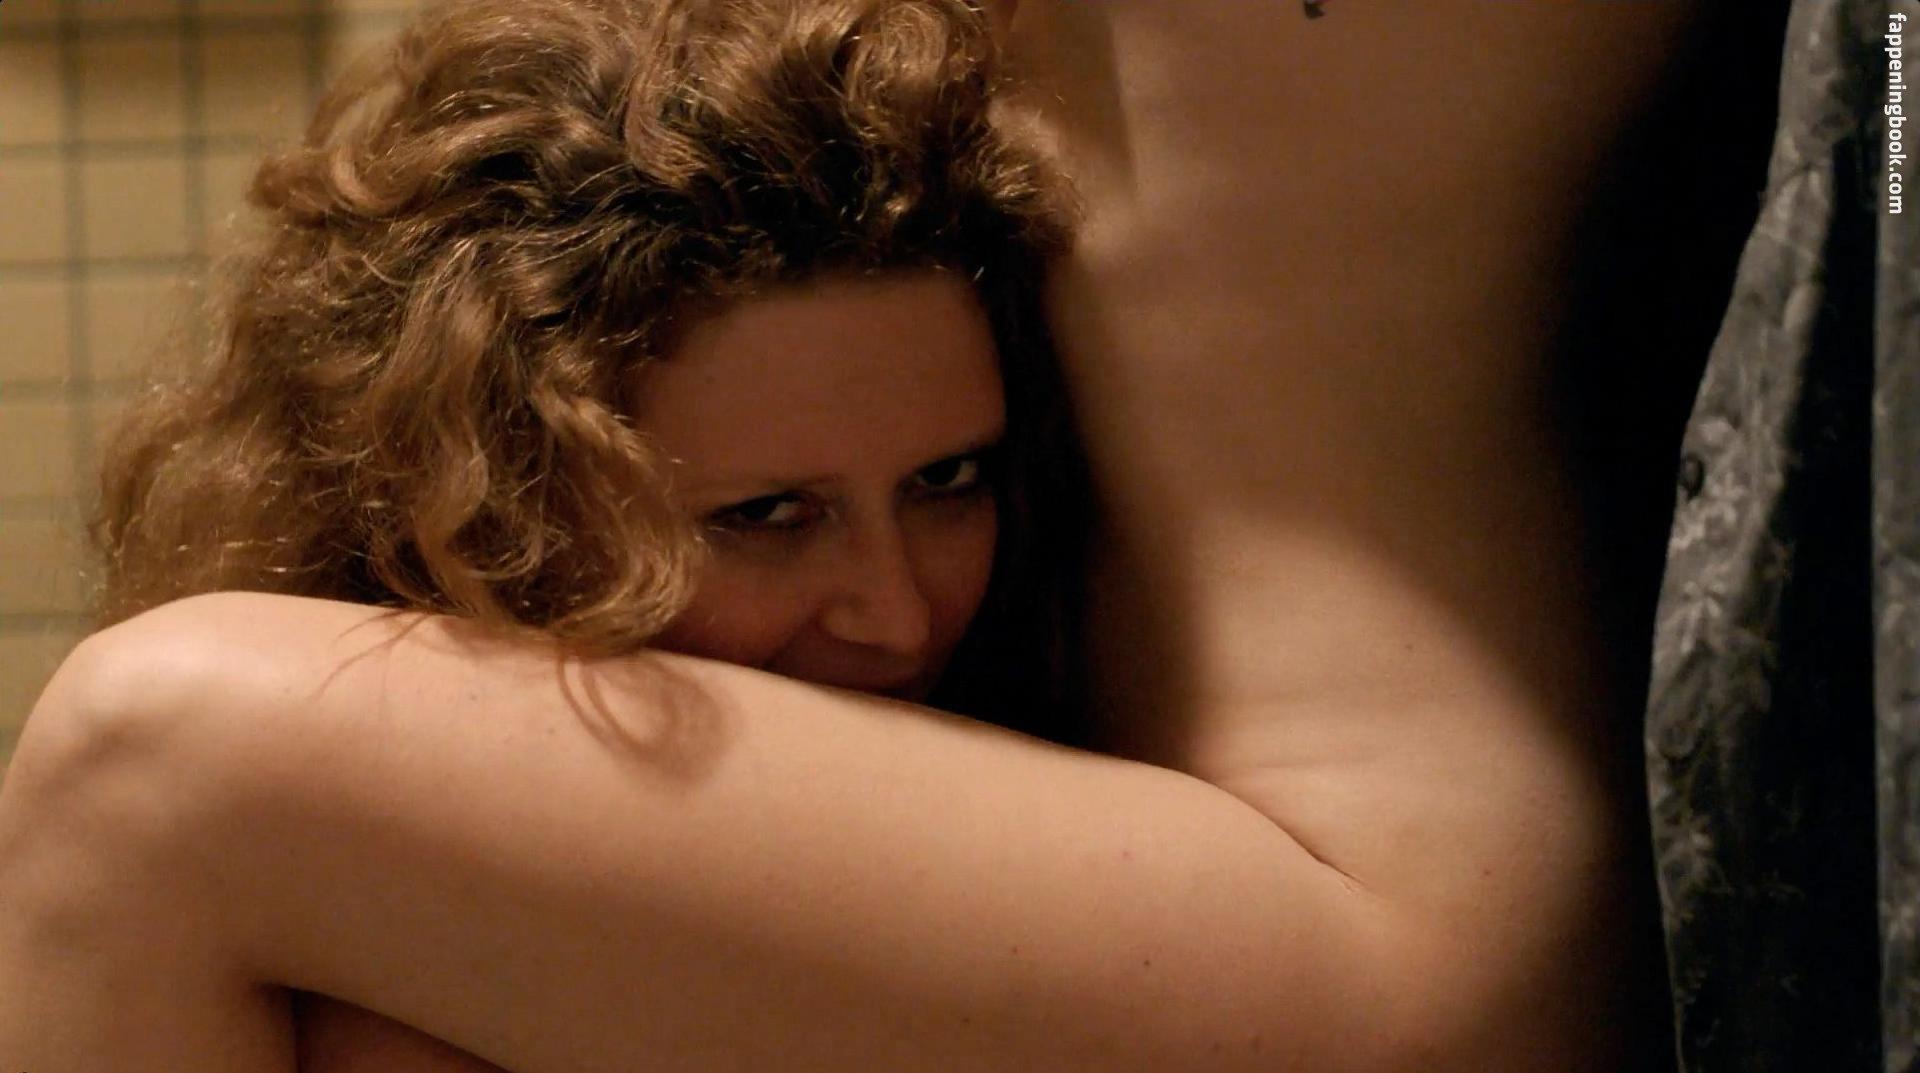 Natasha lyonne fake nudes — photo 2